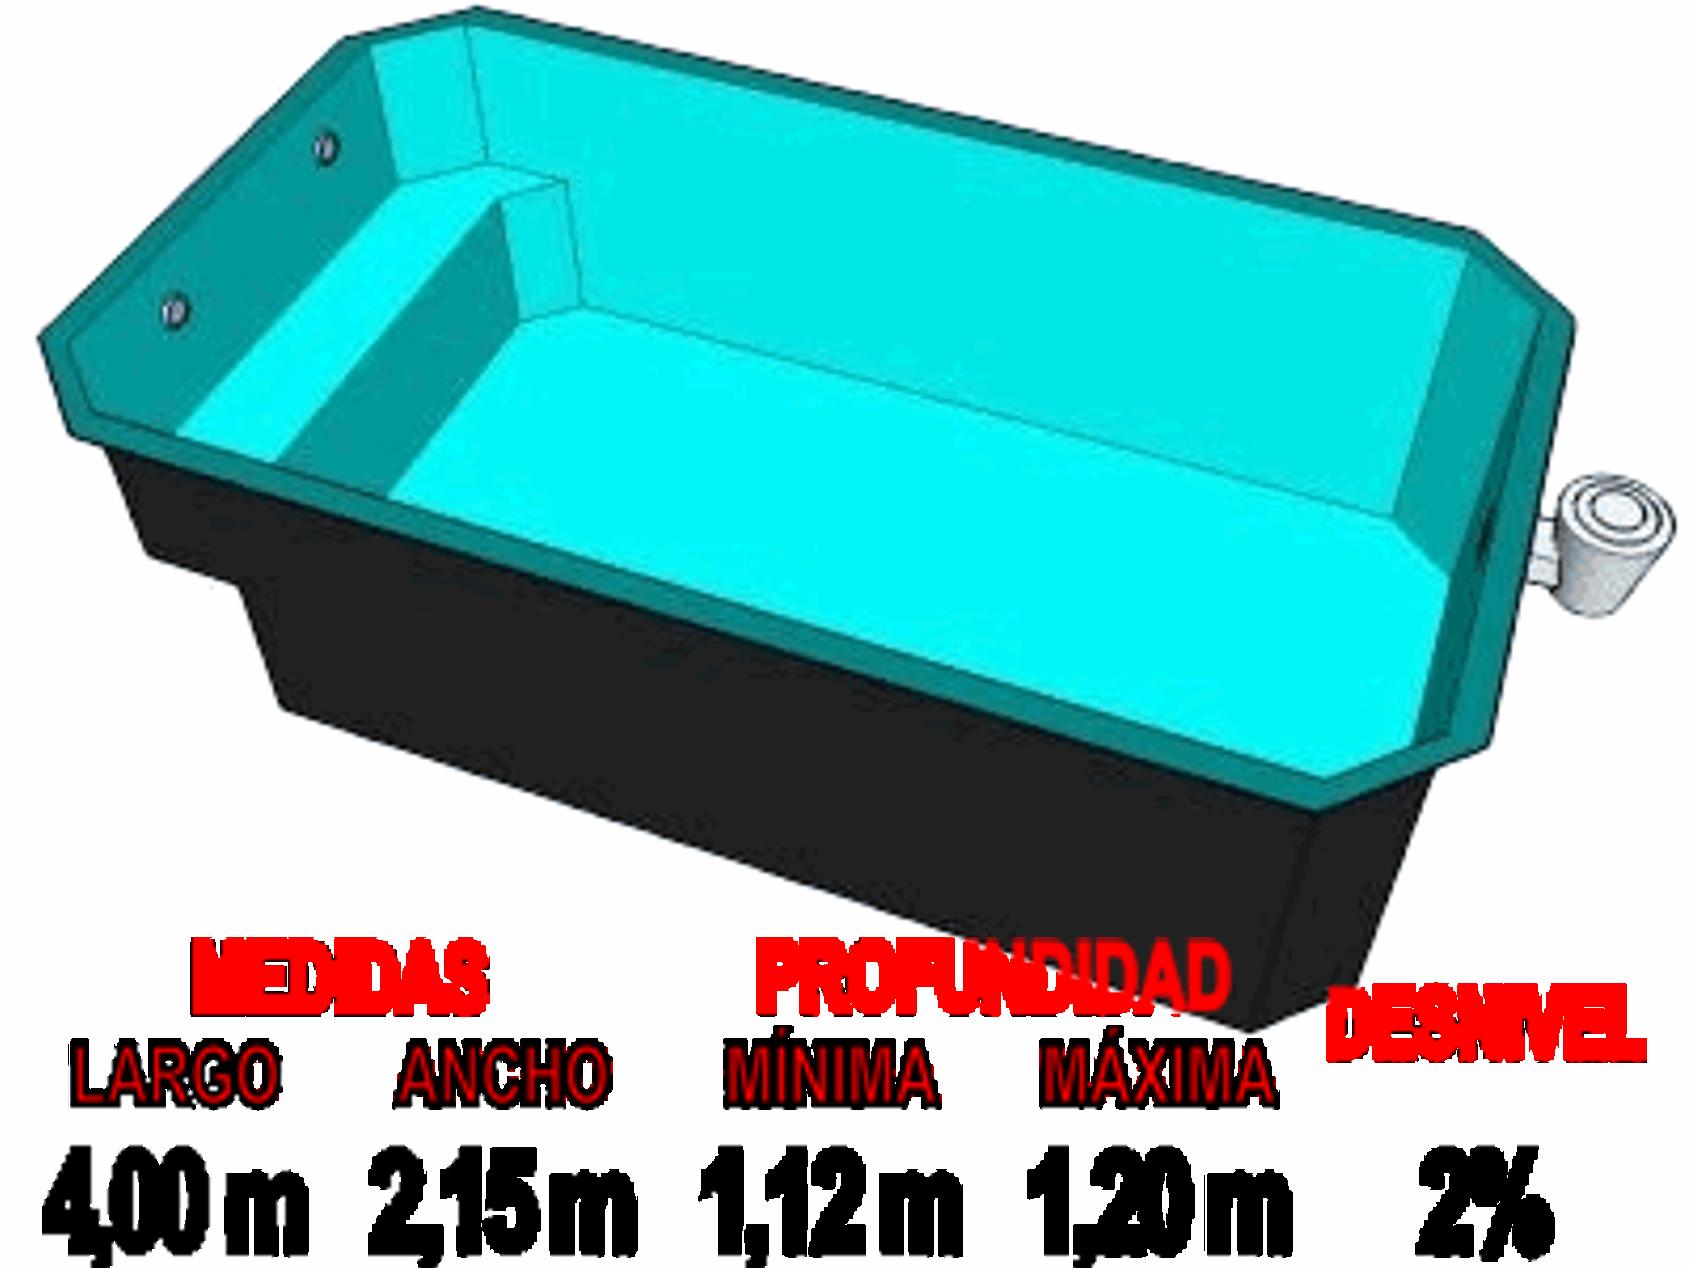 Barpool piscinas prefabricadas de poliester reforzadas for Piscinas de fibra de vidrio mexico